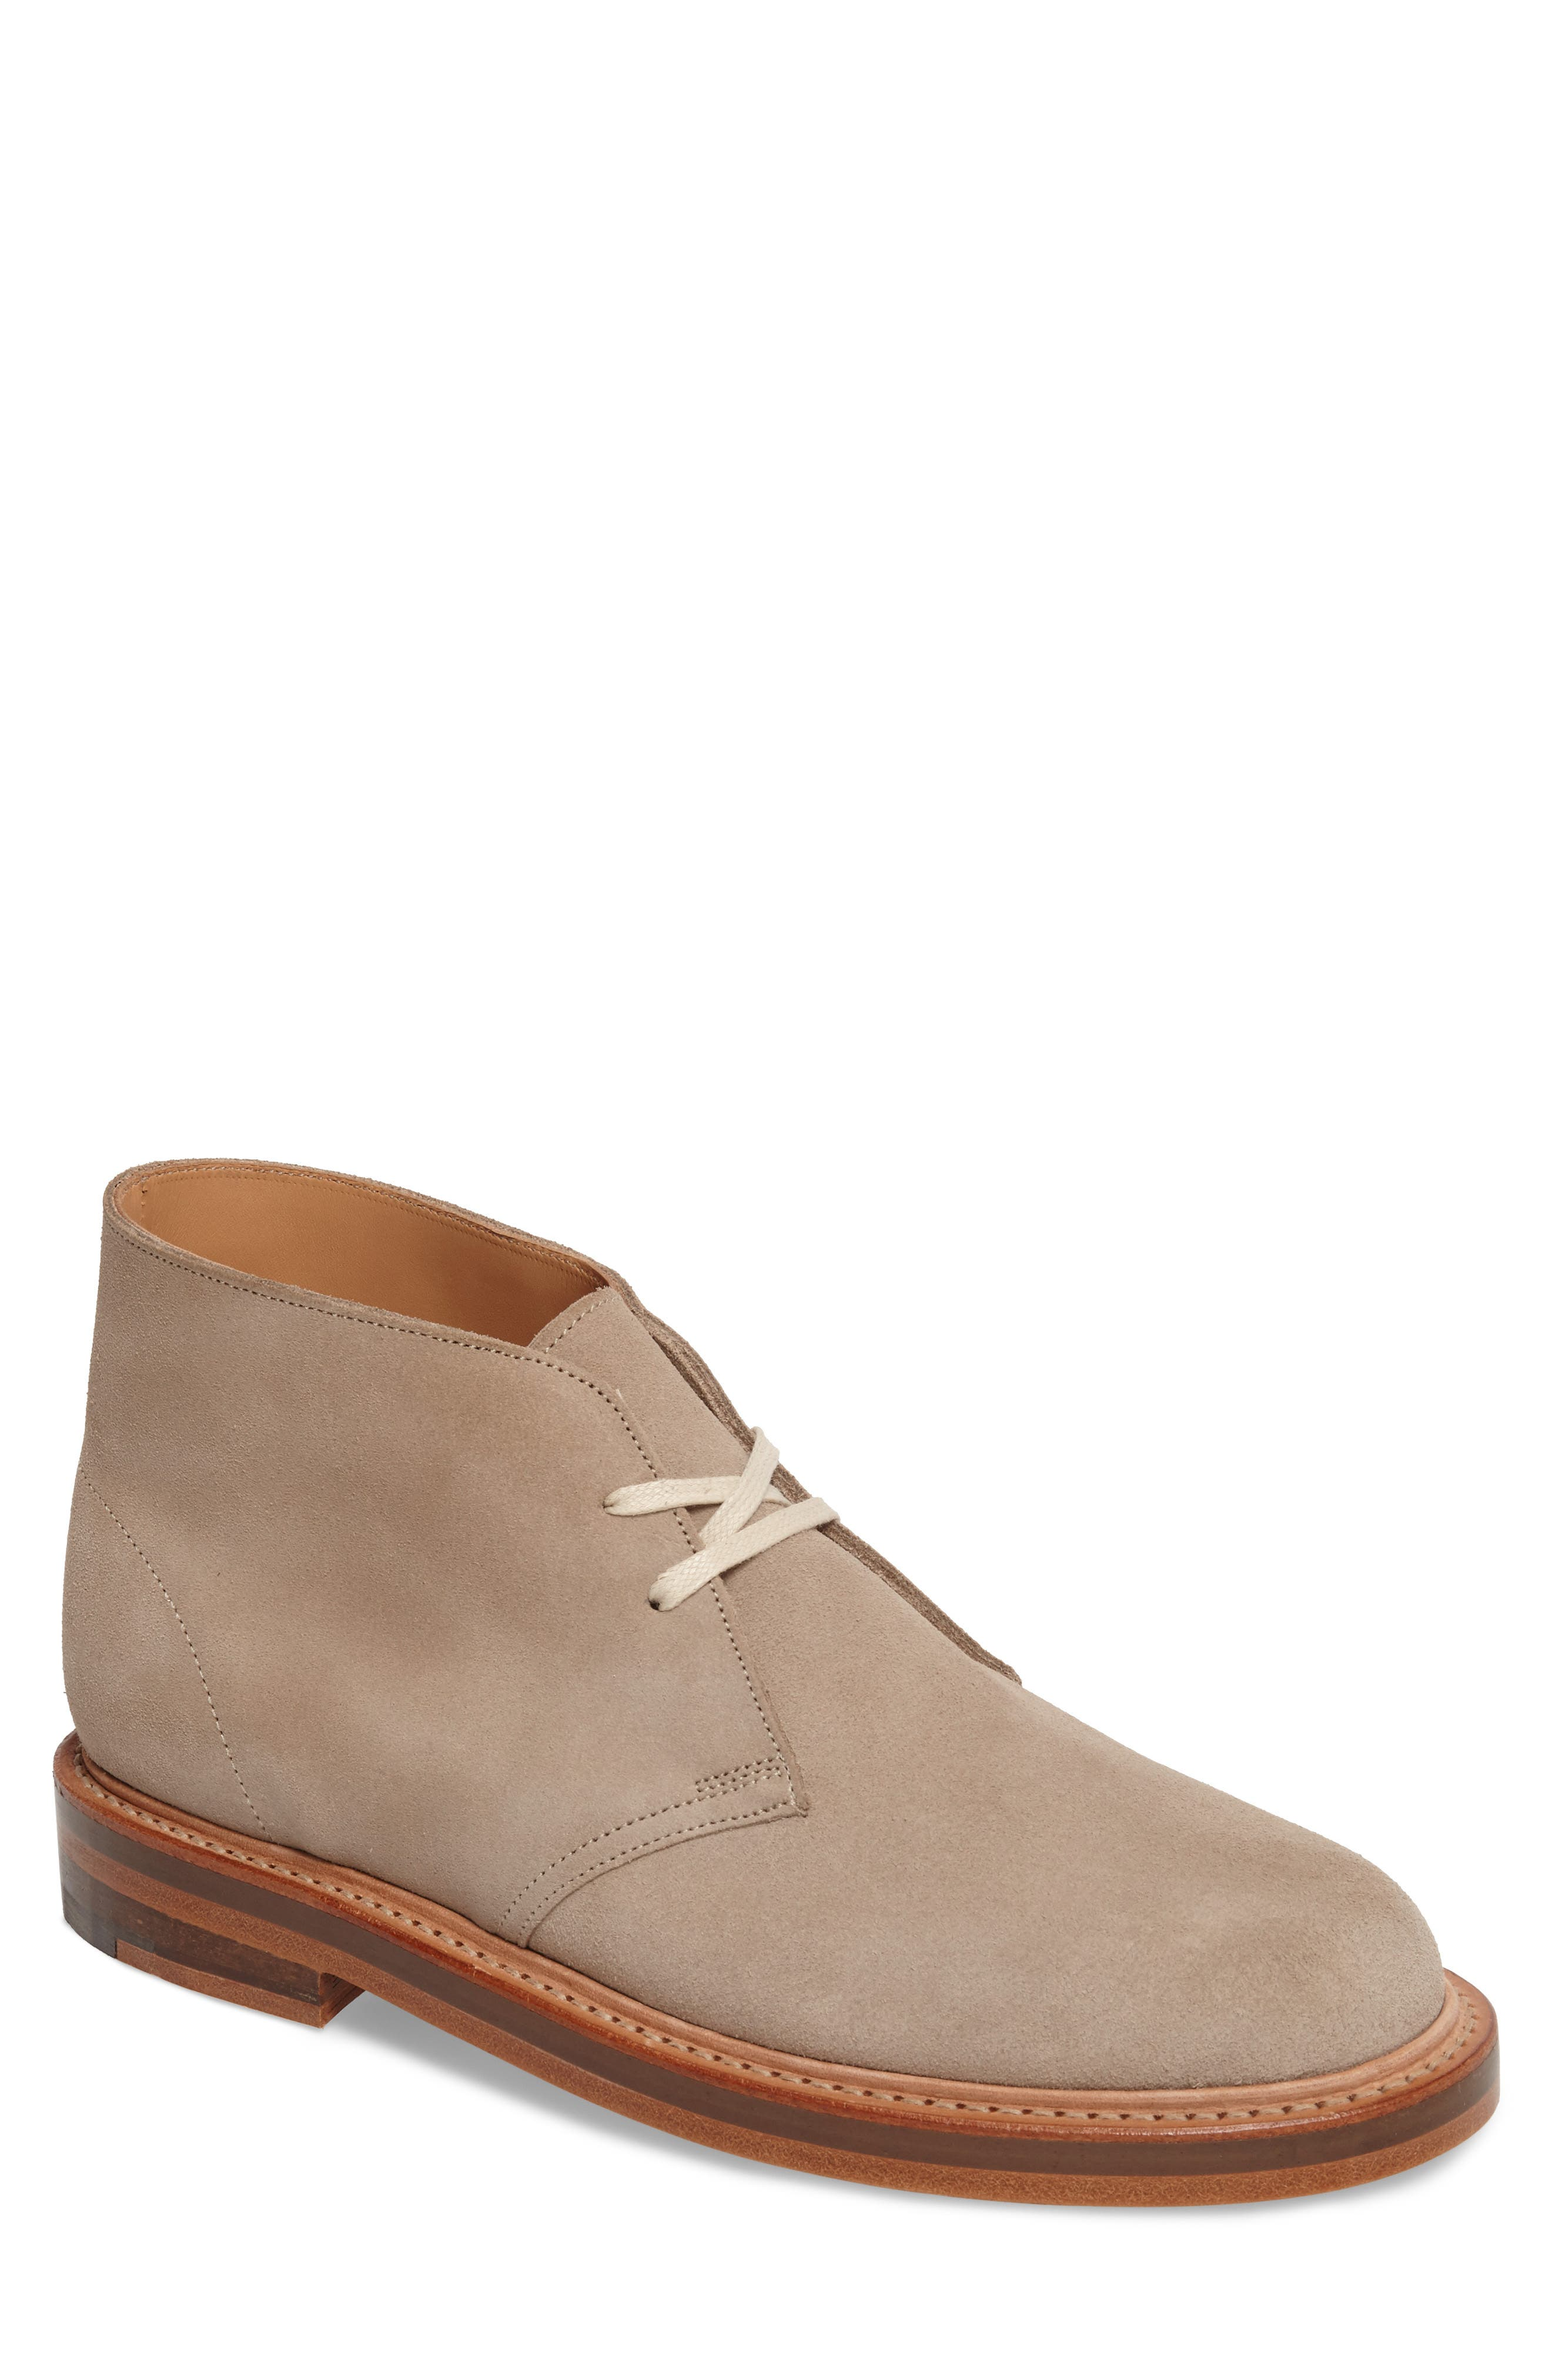 Clarks Desert Chukka Boot, Brown